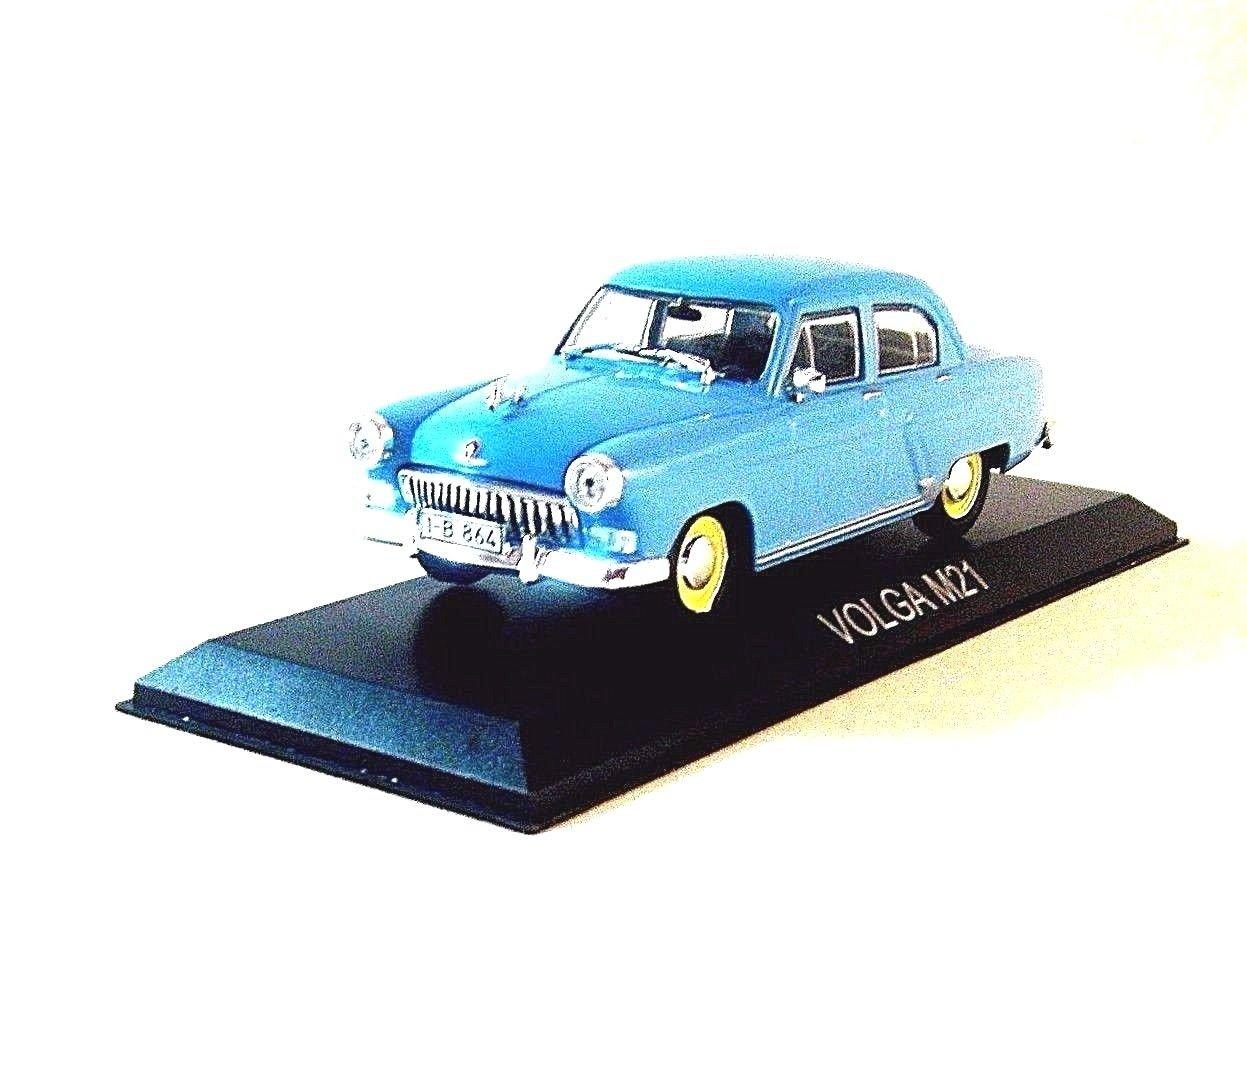 VOLGA M21, ALTAYA 1/43 LIGHT BLUE DIECAST CAR COLLECTOR'S MODEL, NEW